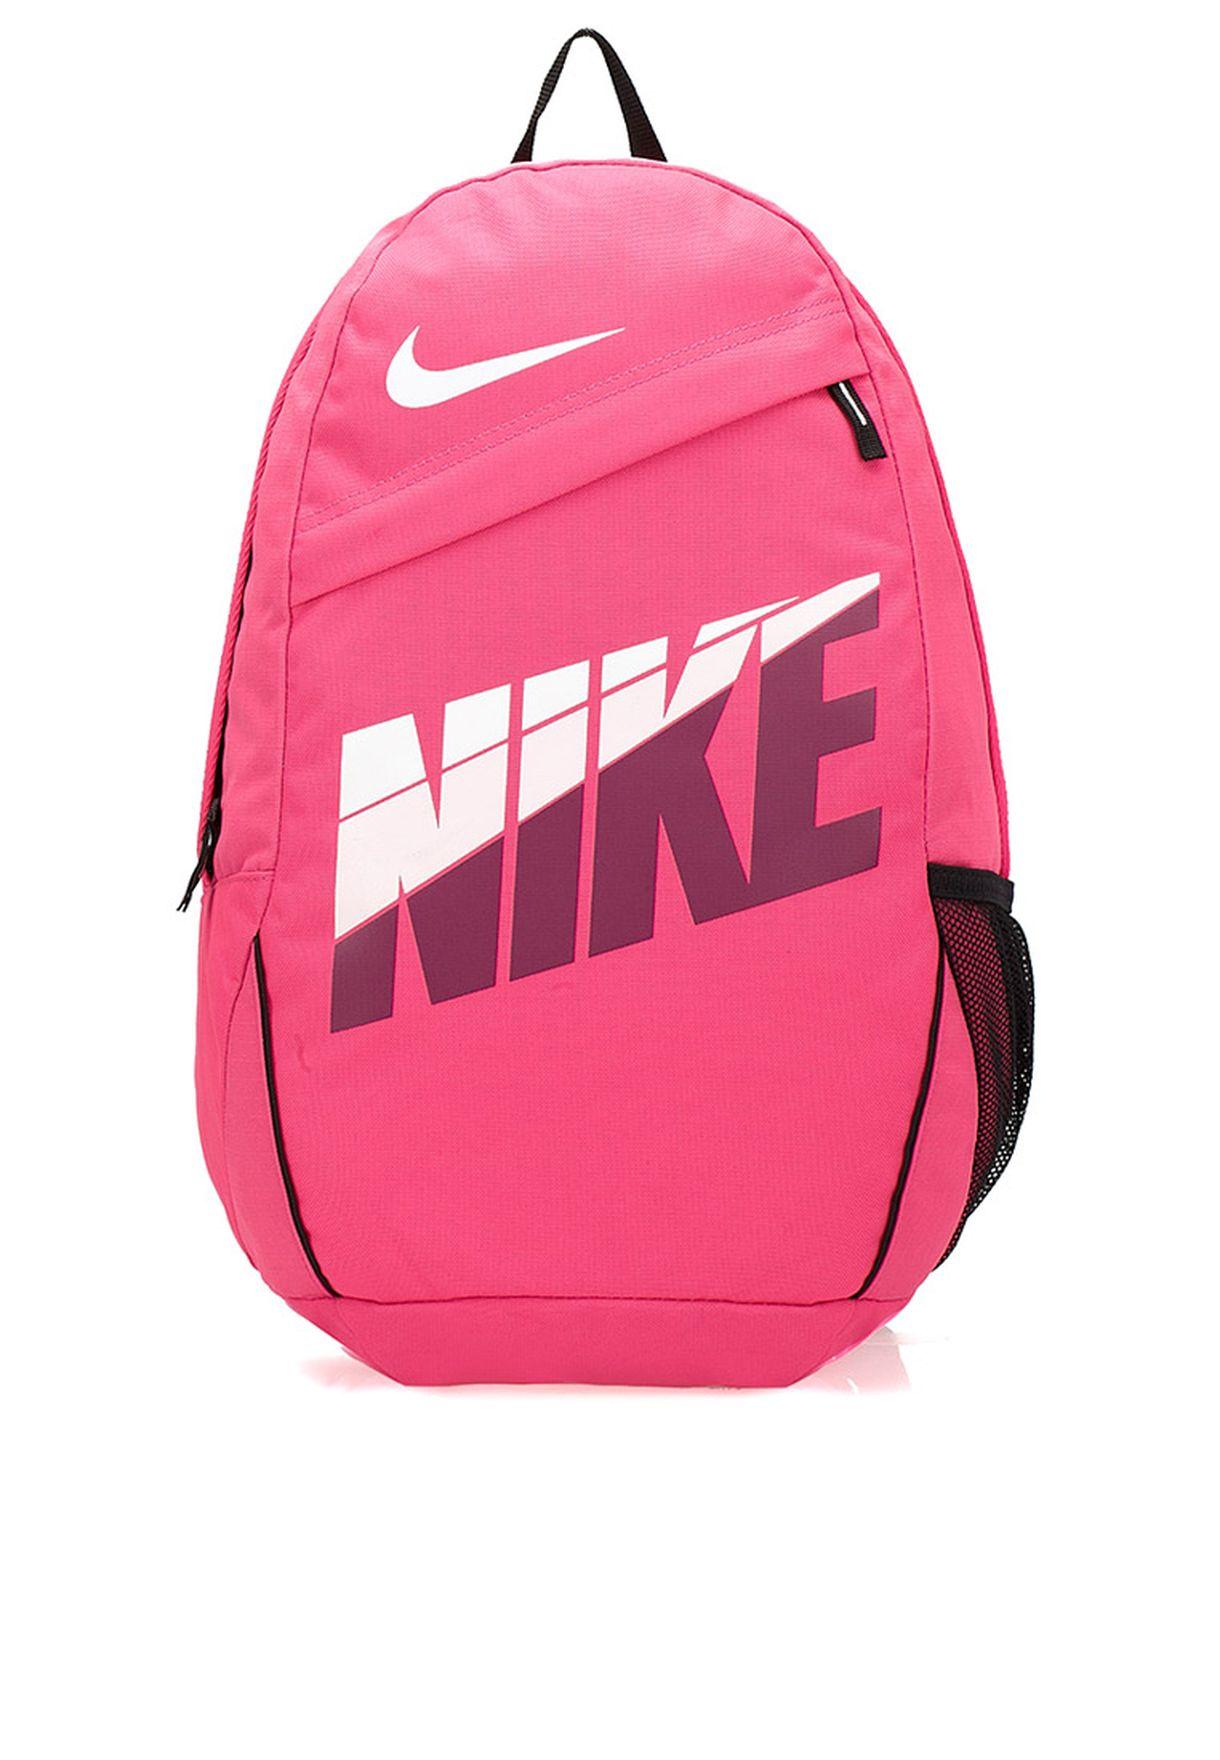 dd6753cb22 Shop Nike pink Classic Turf Backpack NEQP-BA4379-674 for Women in ...